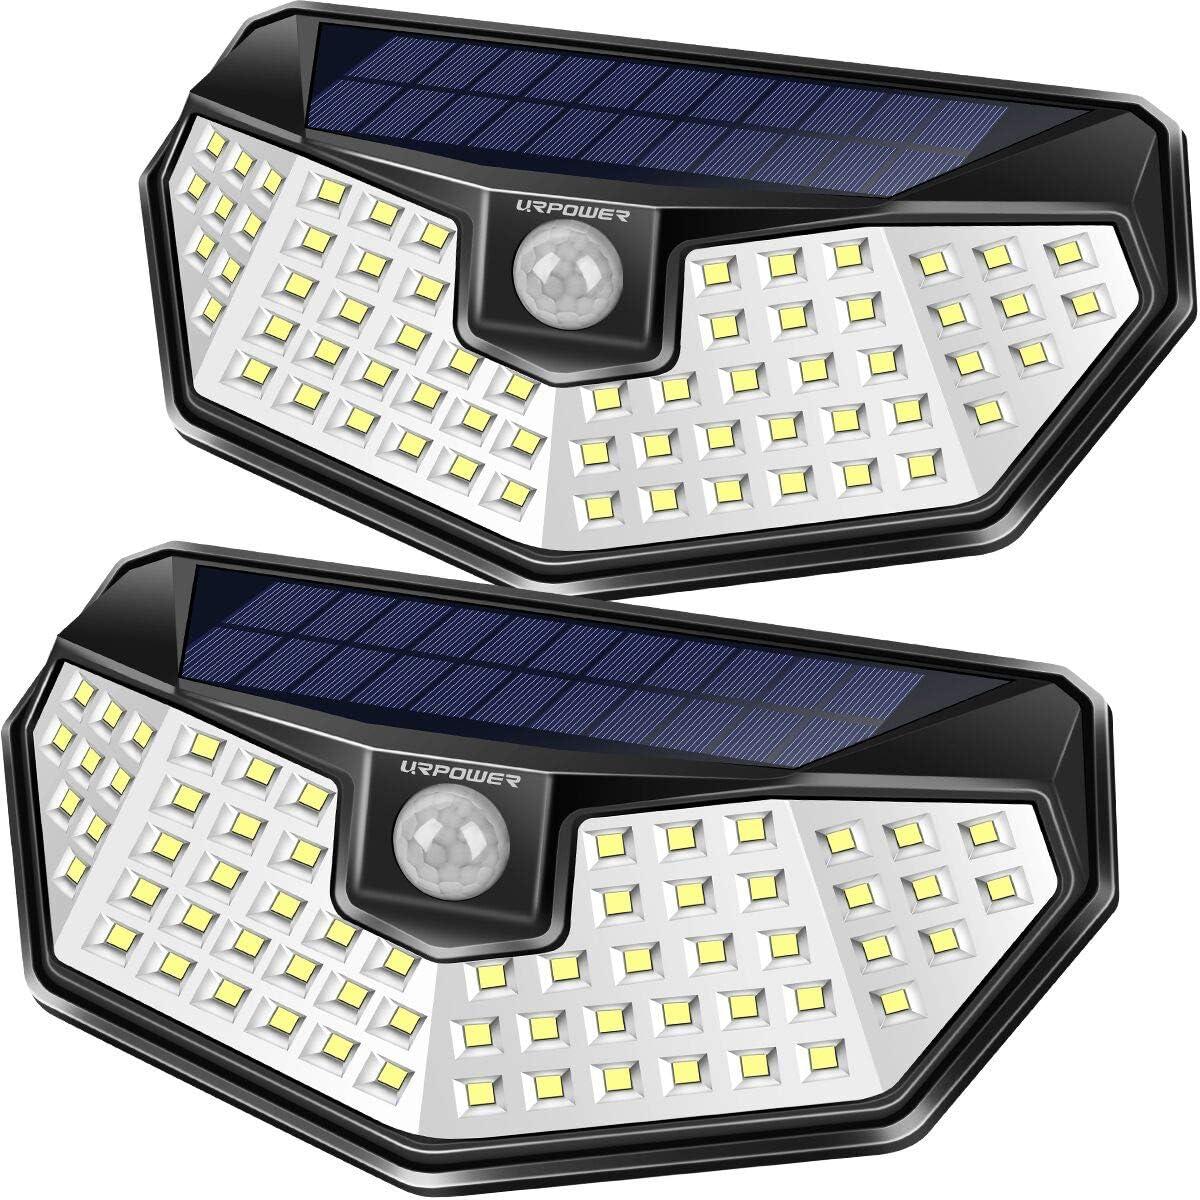 URPOWER solar security lights